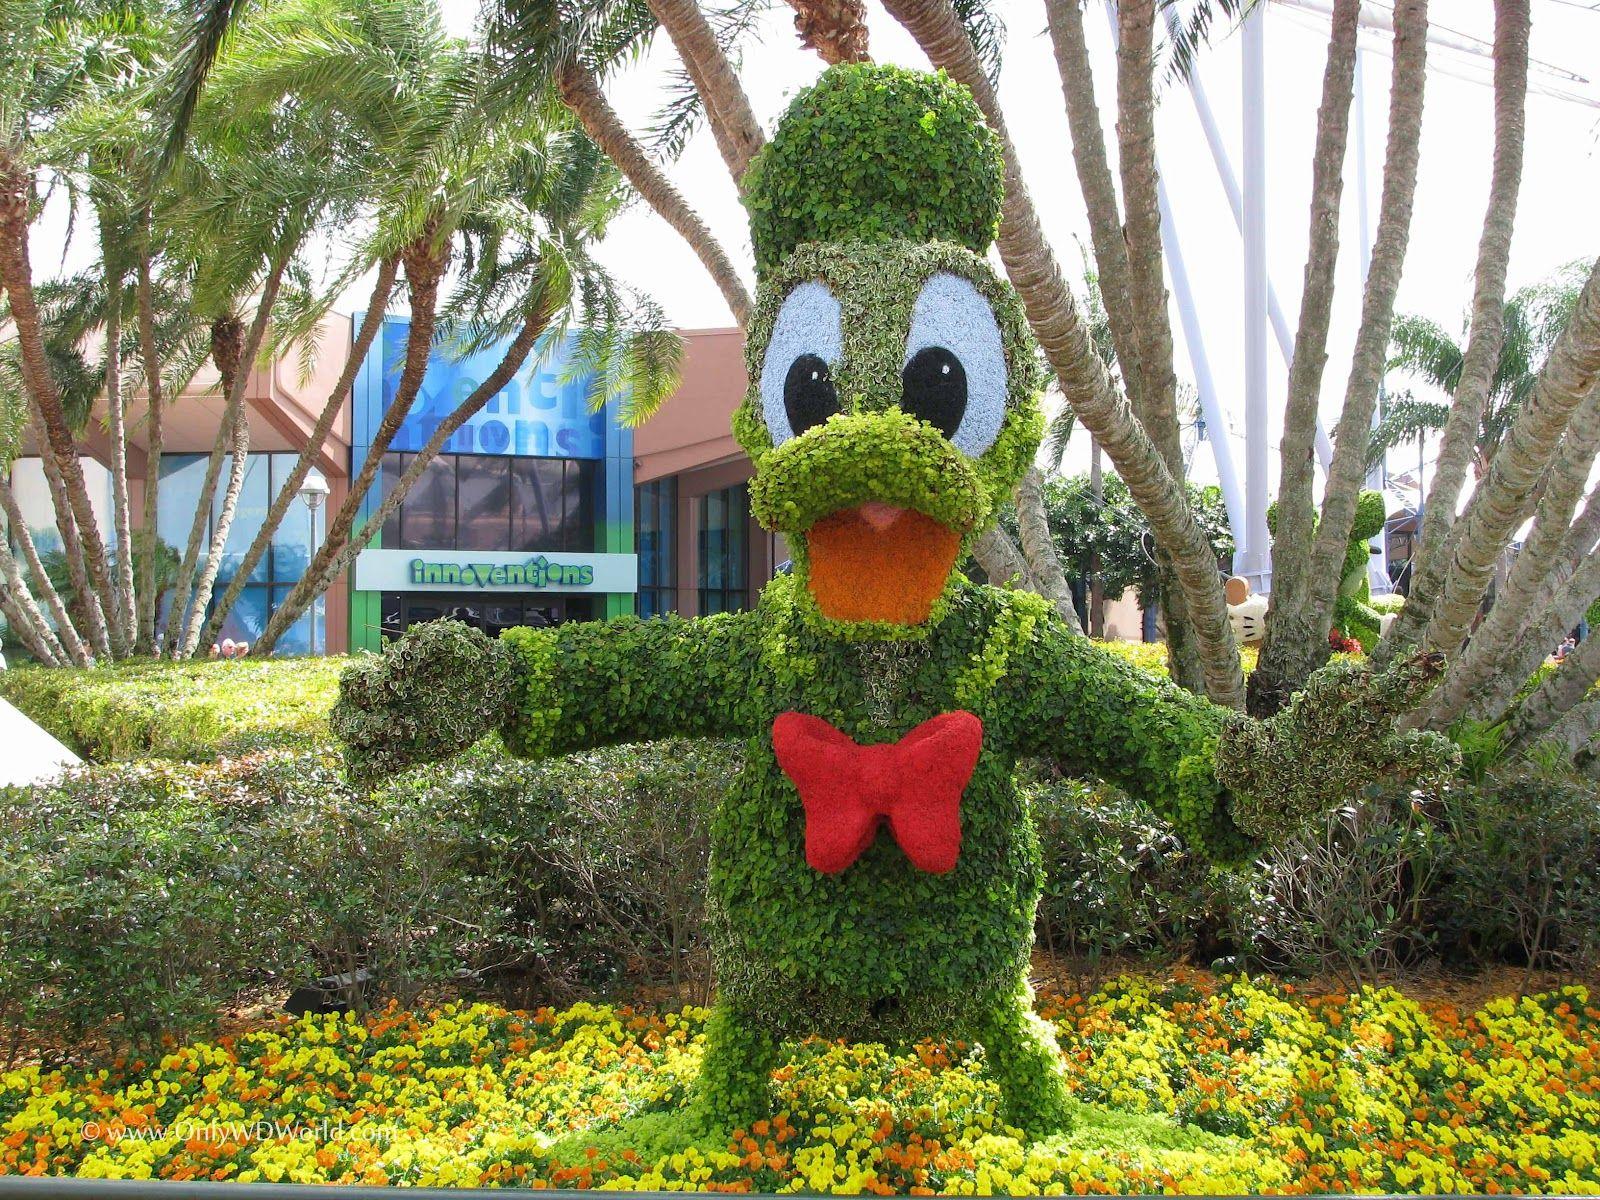 Disney Topiary Part - 15: Disney Topiaries | Donald Duck